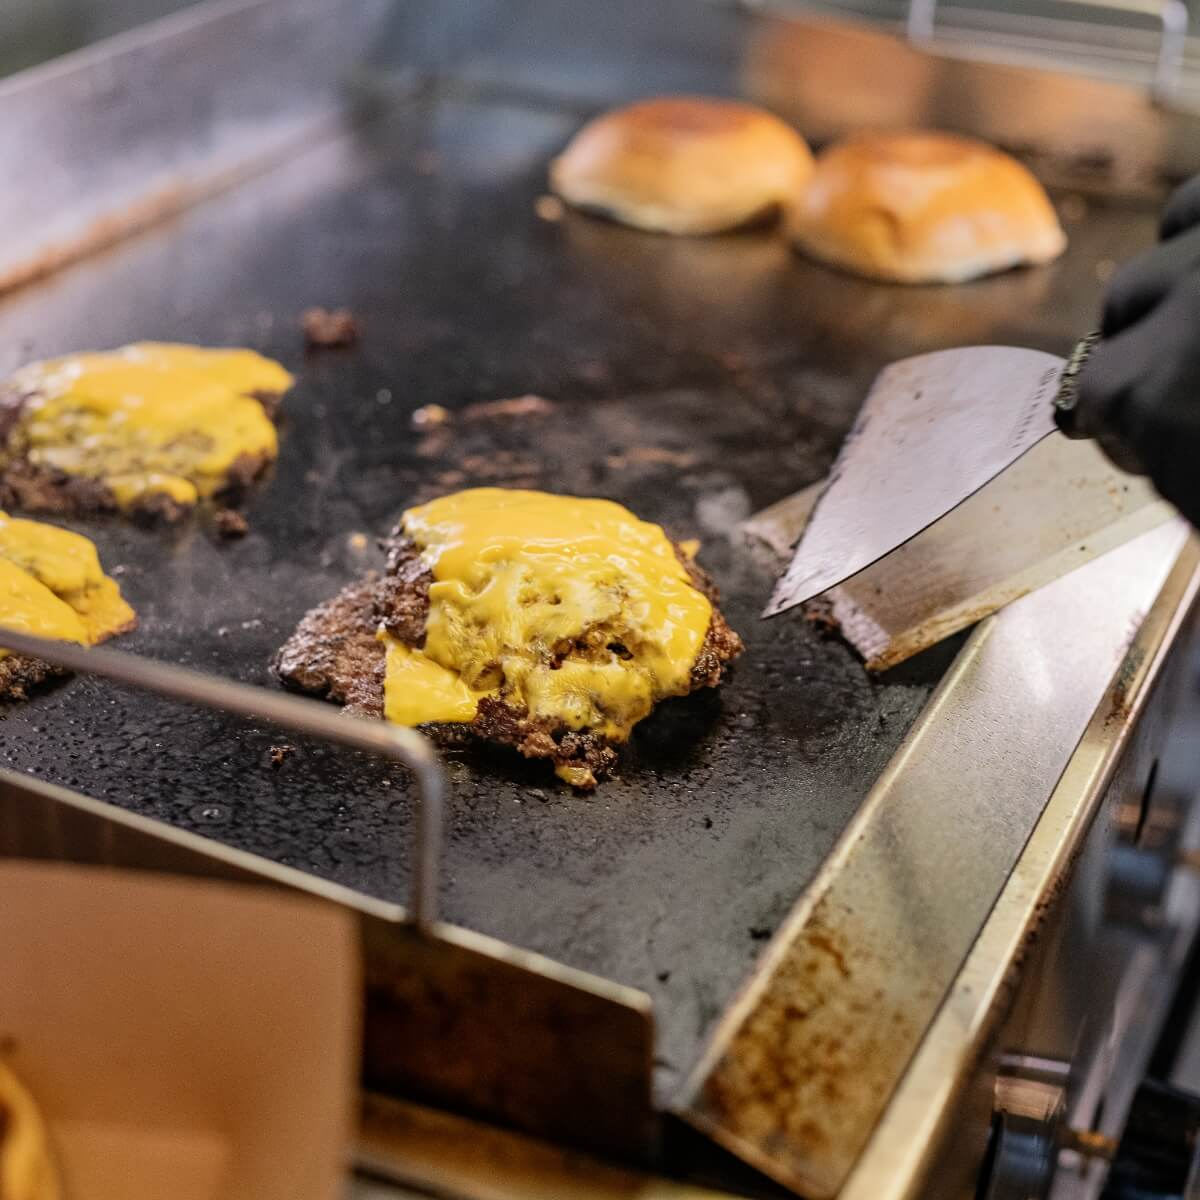 Lunchtruck Gallery: Hotdog